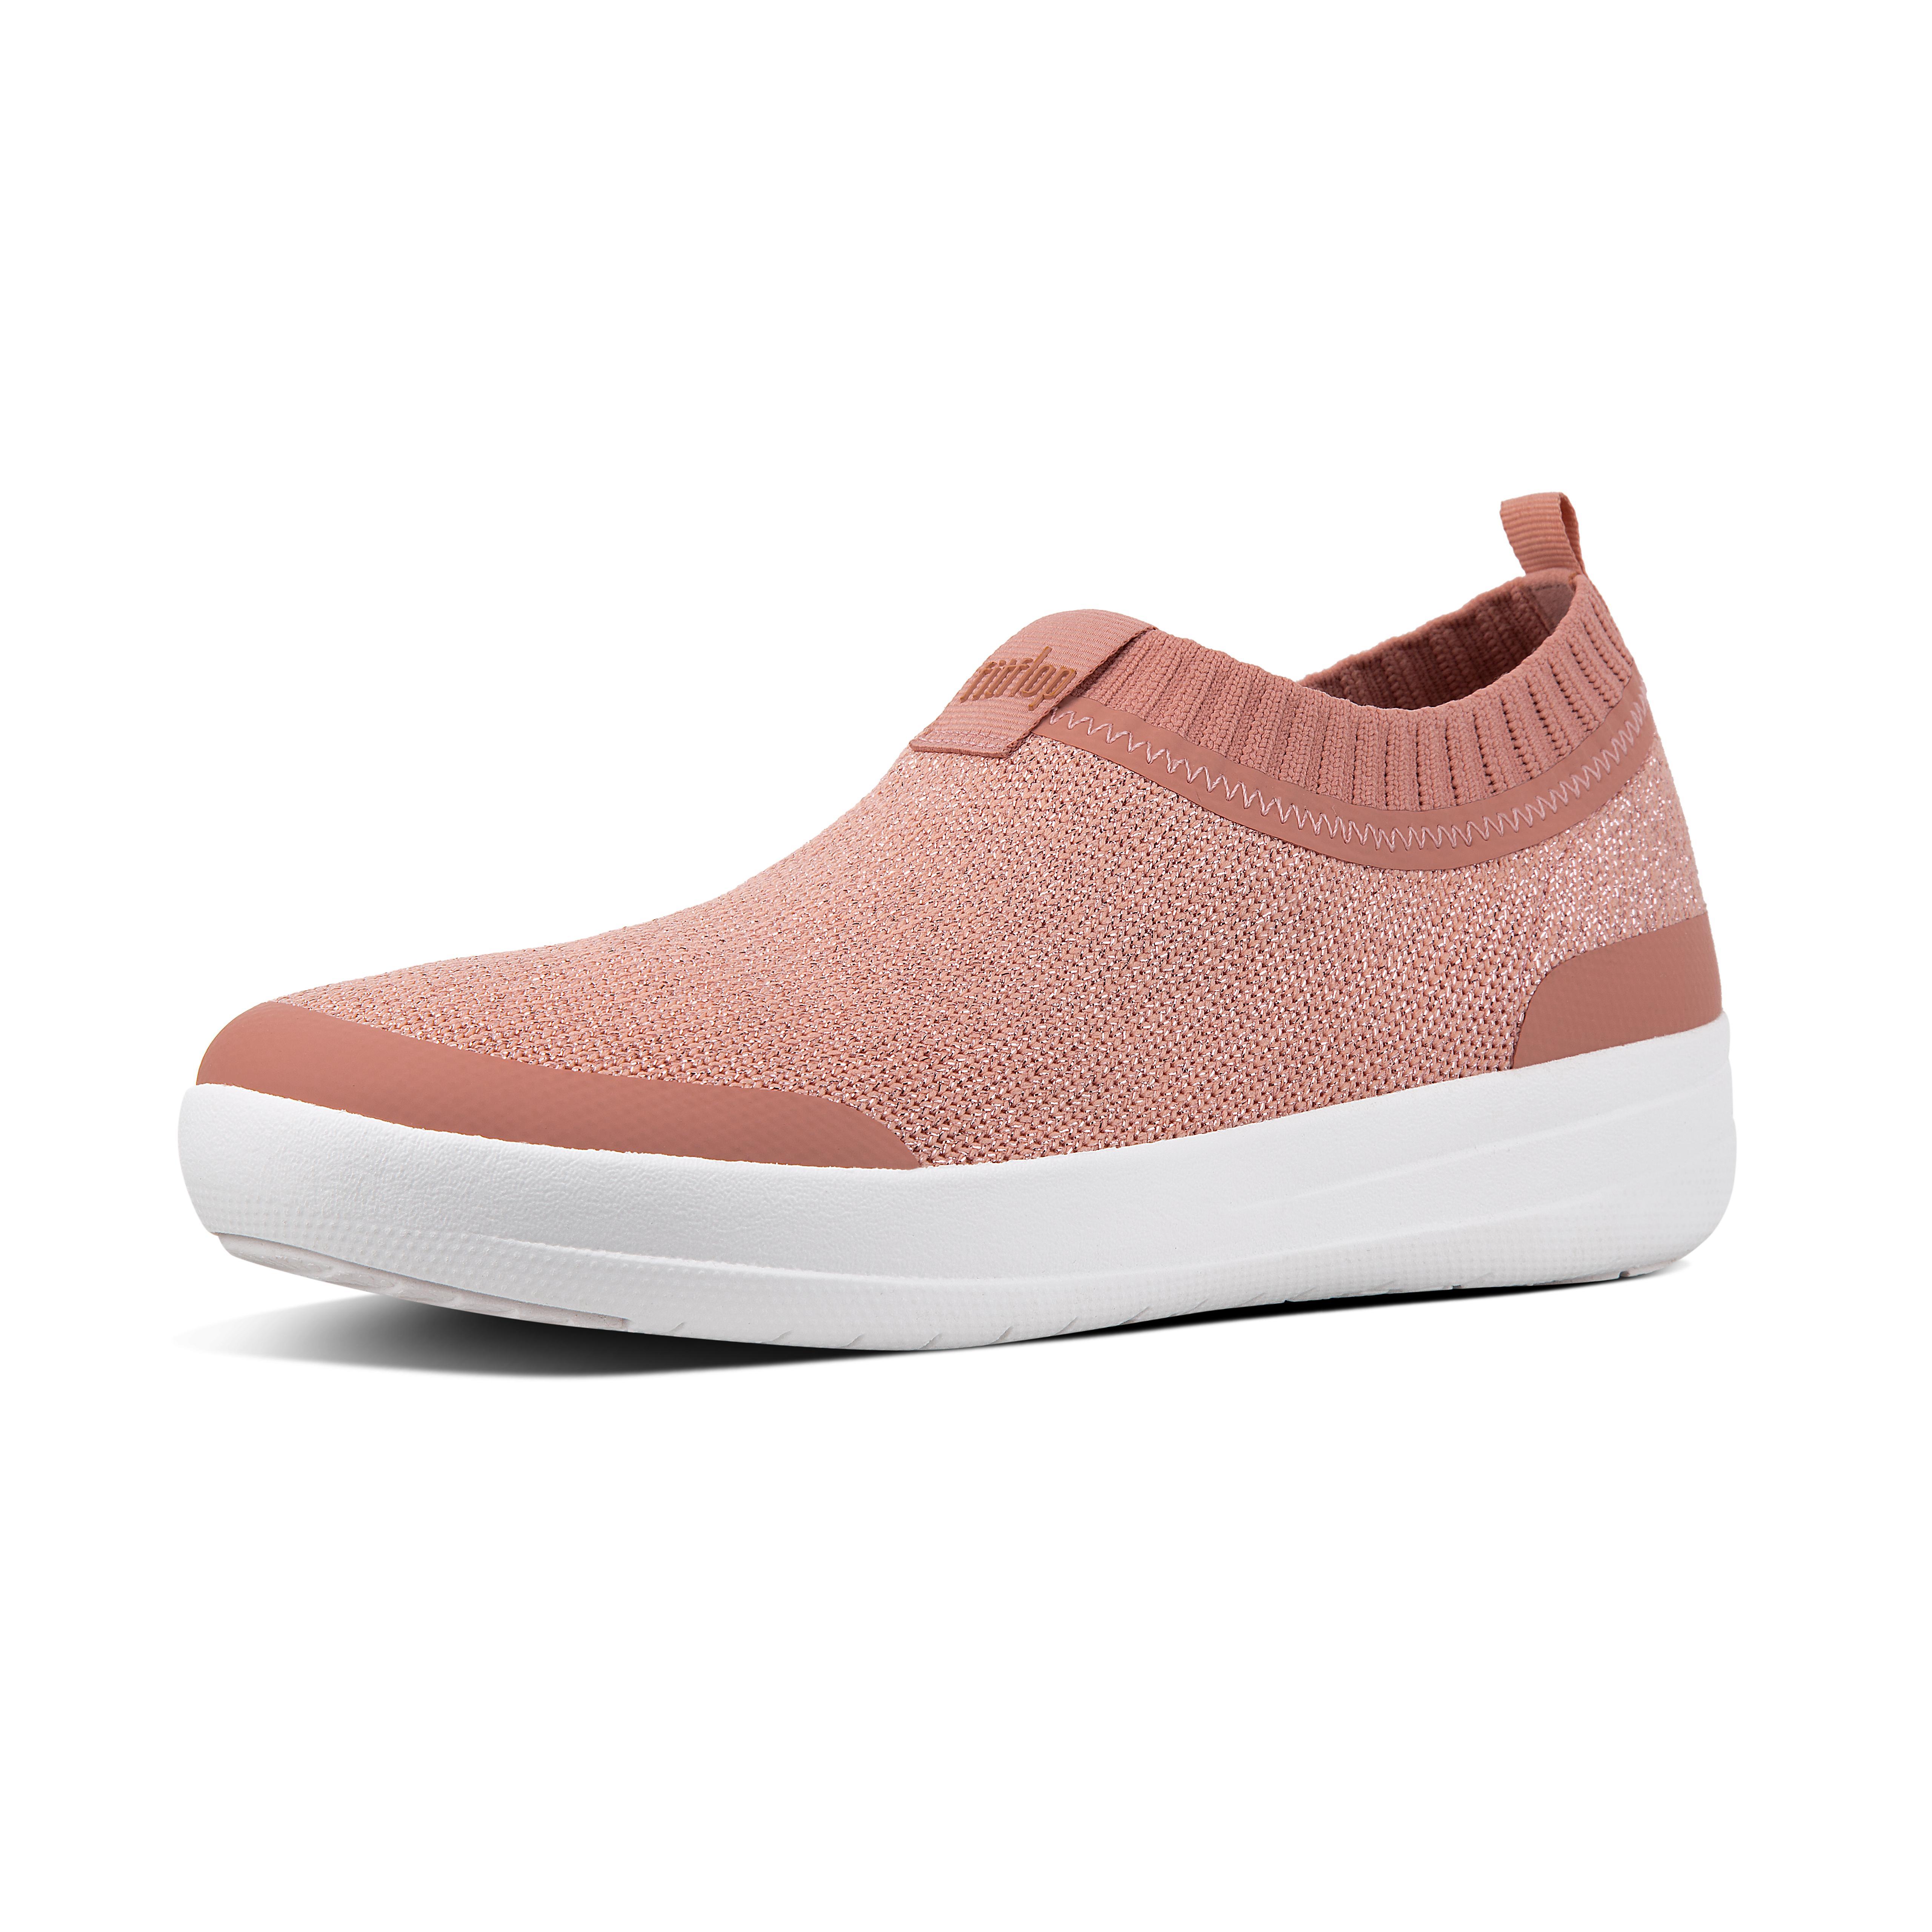 Uberknit slip on sneakers dusty pink metallic o84 612